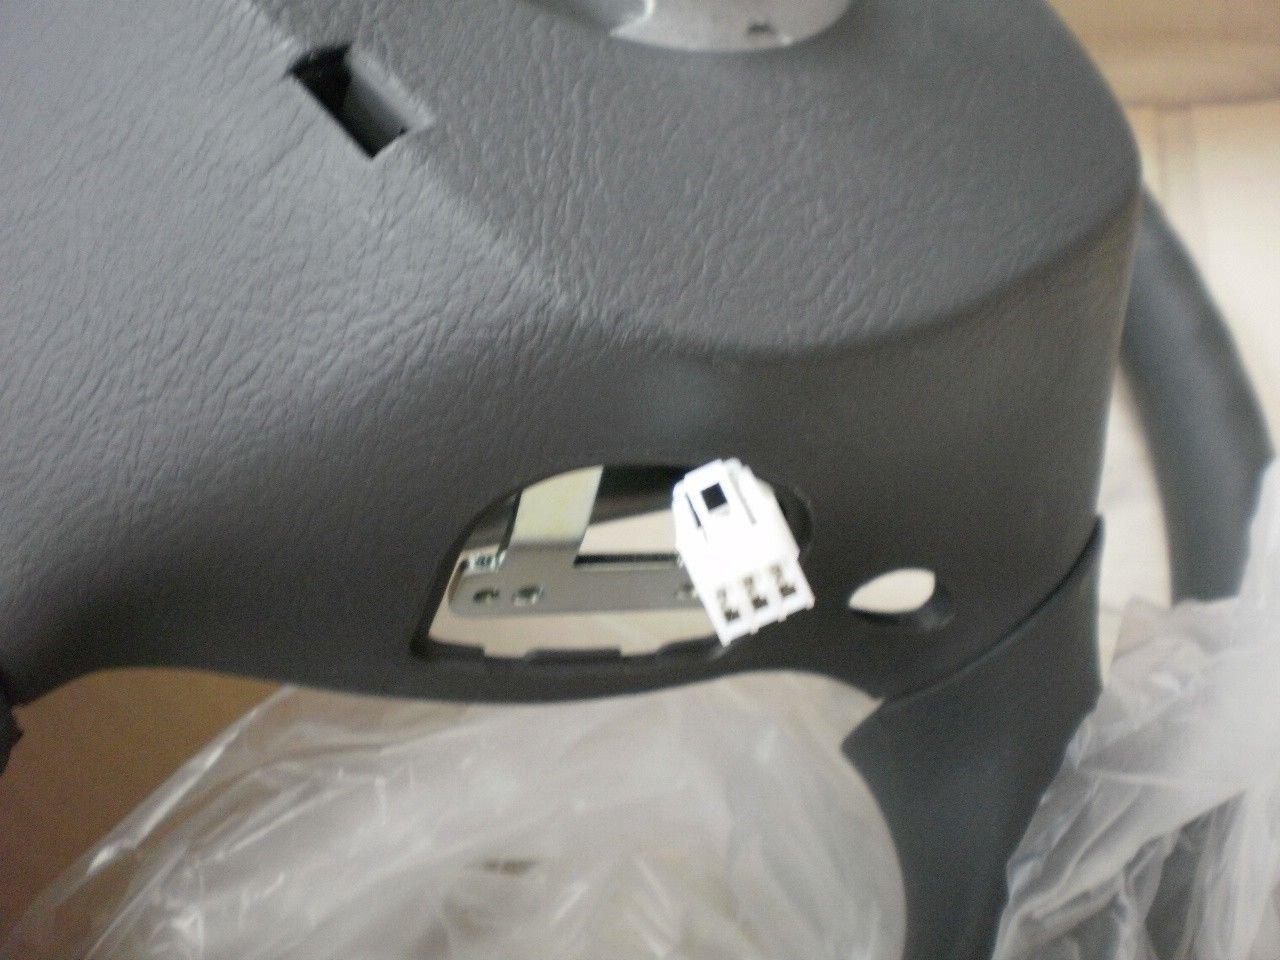 Genuine Hyundai 56110-26701-GK Steering Wheel Body Assembly